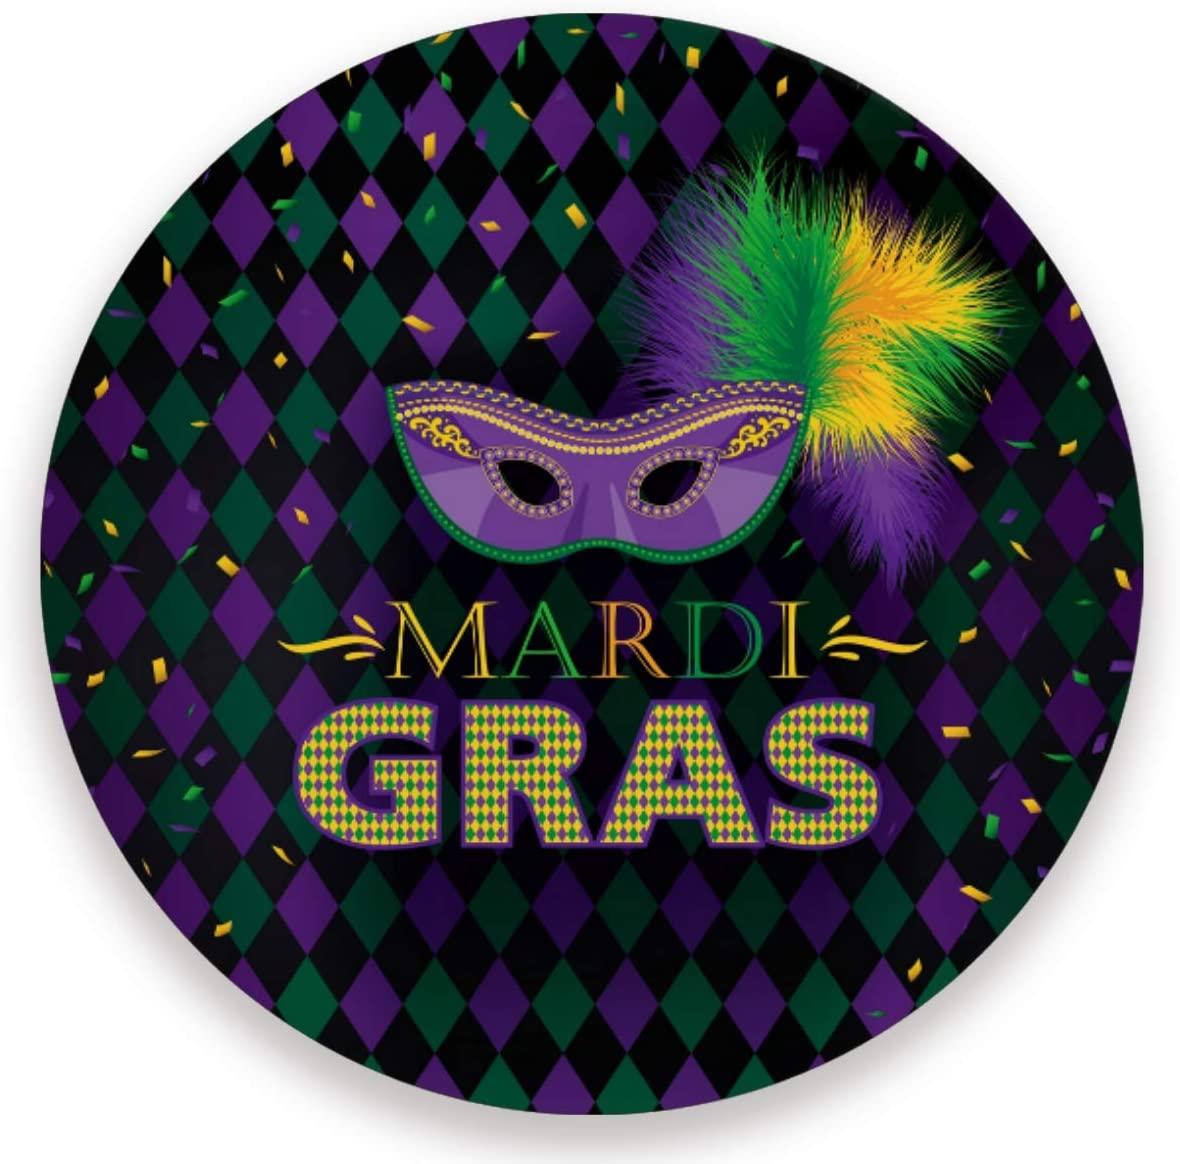 Olinyou Mardi Gras Mask Dark Zigzag Coasters for Drinks Set of 2 Absorbent Moisture Absorbing Ceramic Stone Coaster with Cork Base